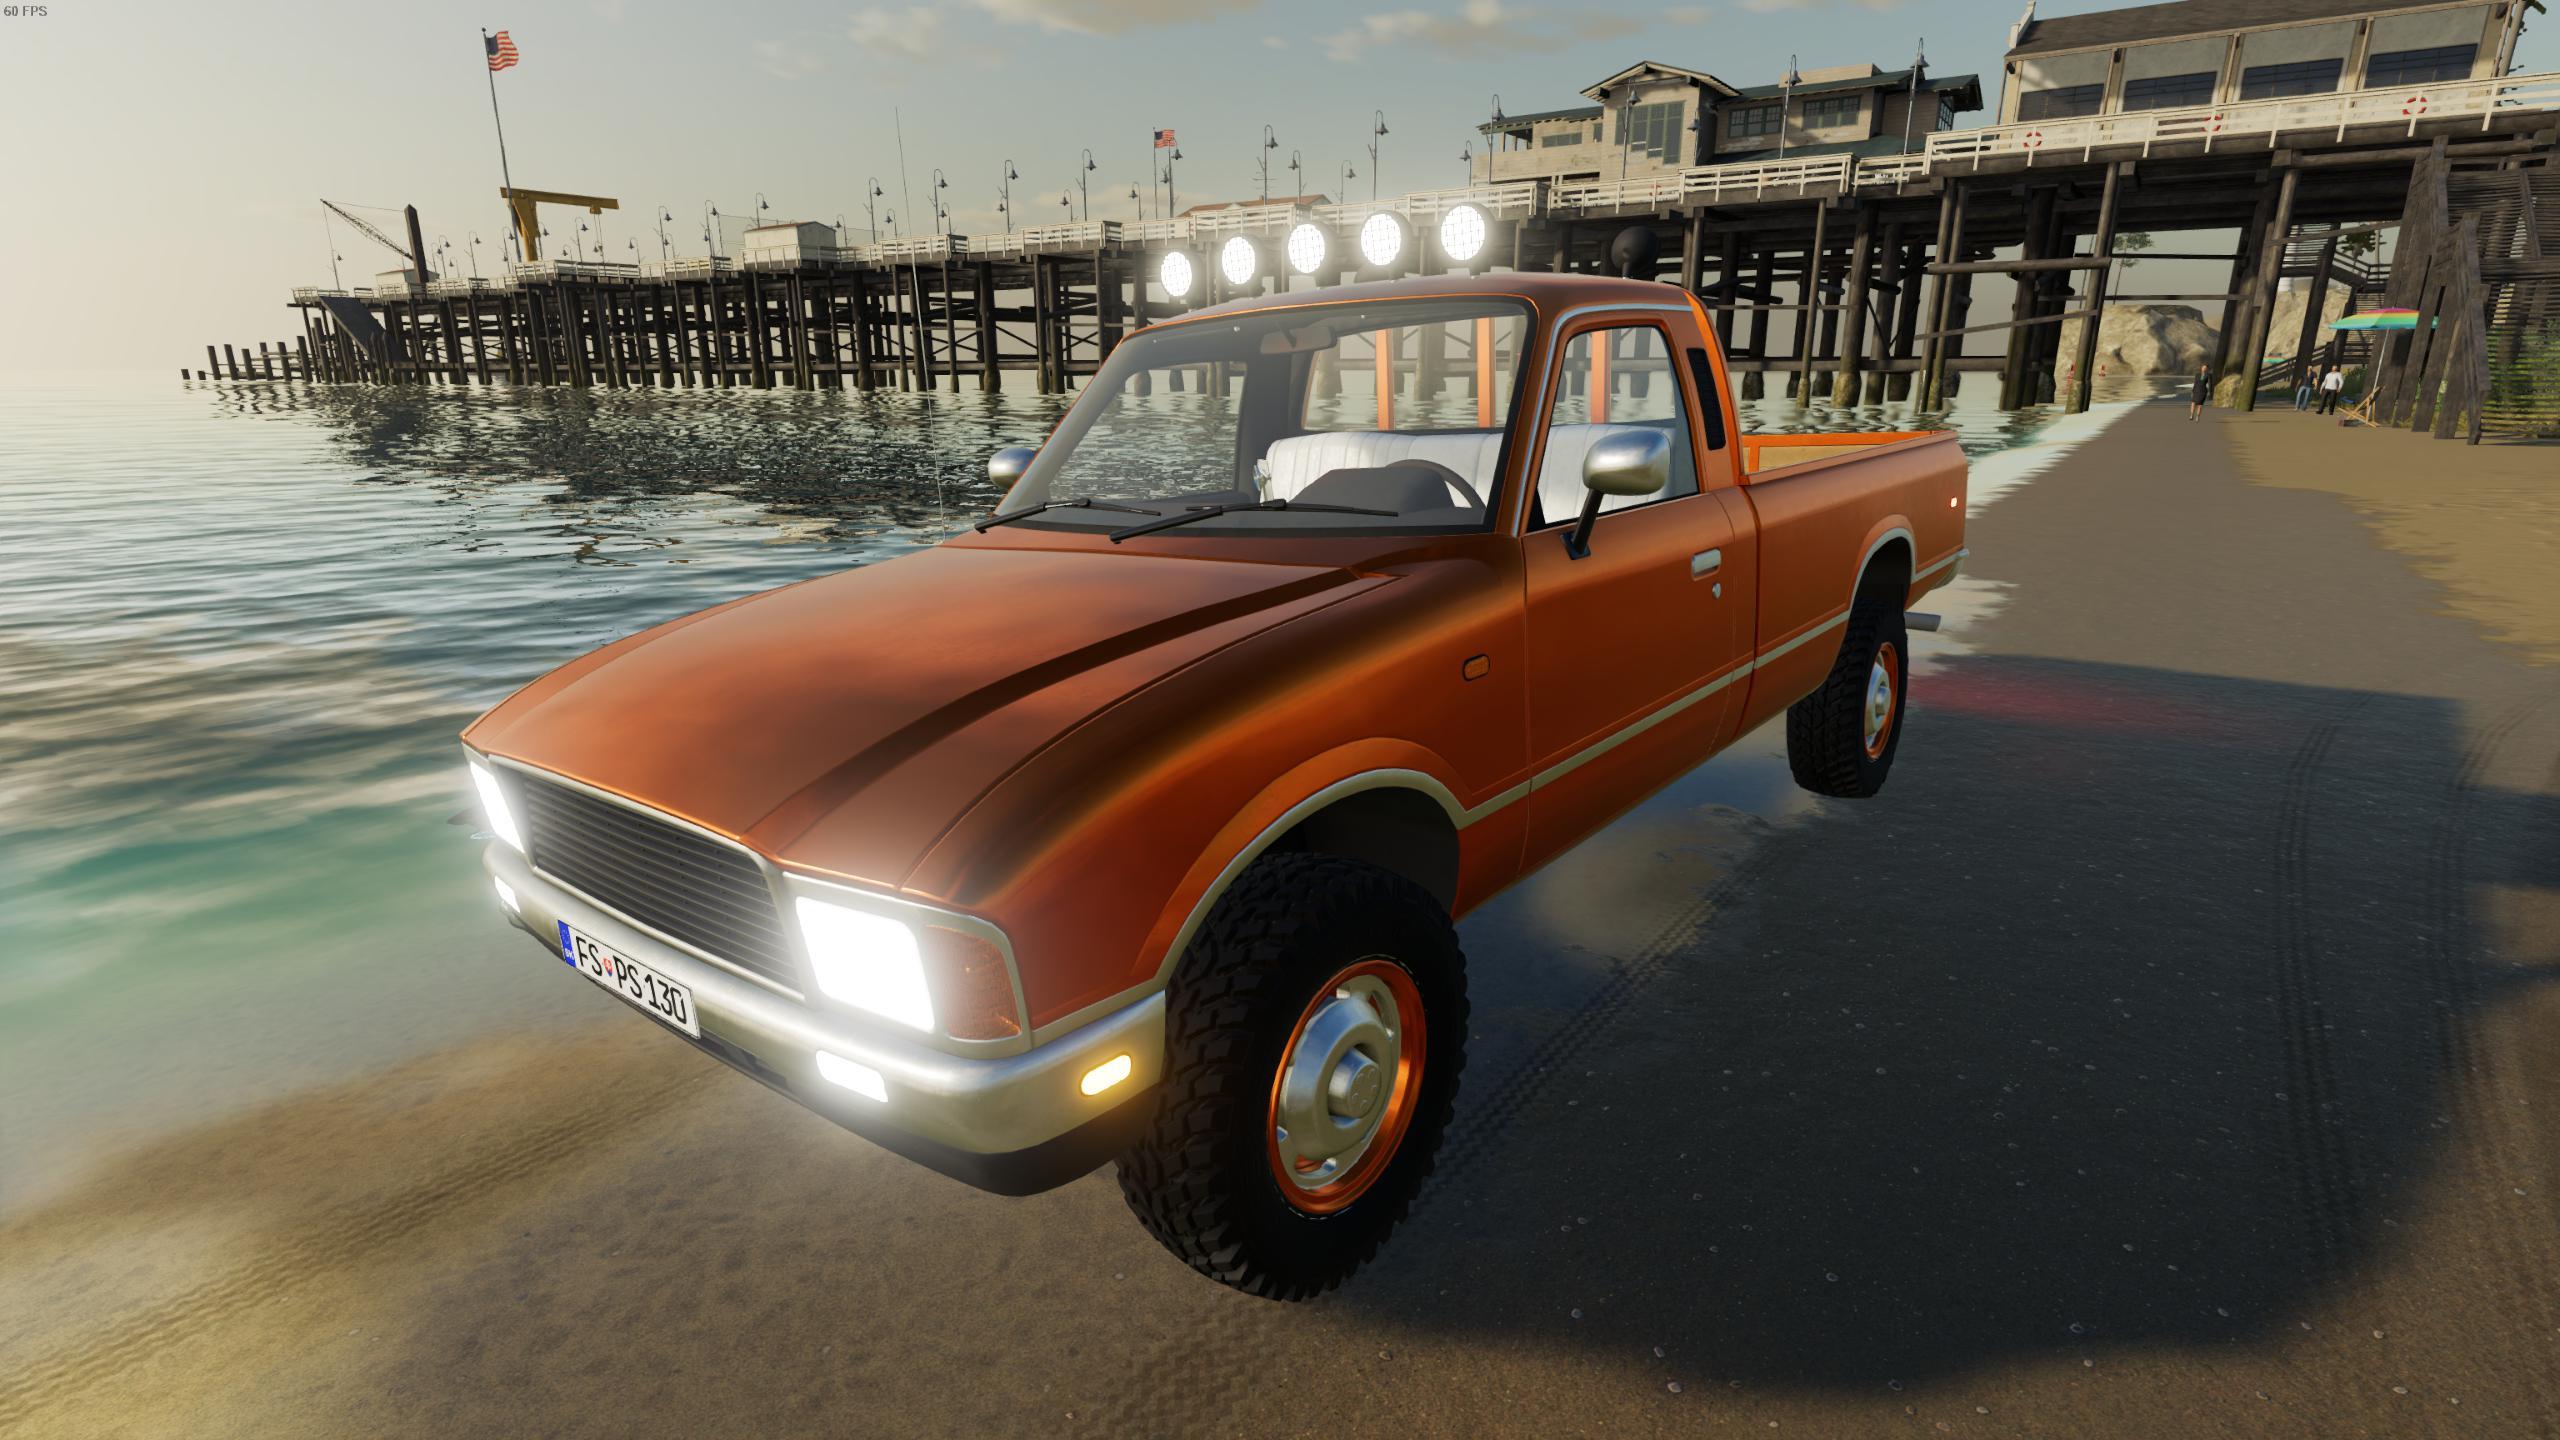 FS19 - Pickup 1978 More Reality V1.0